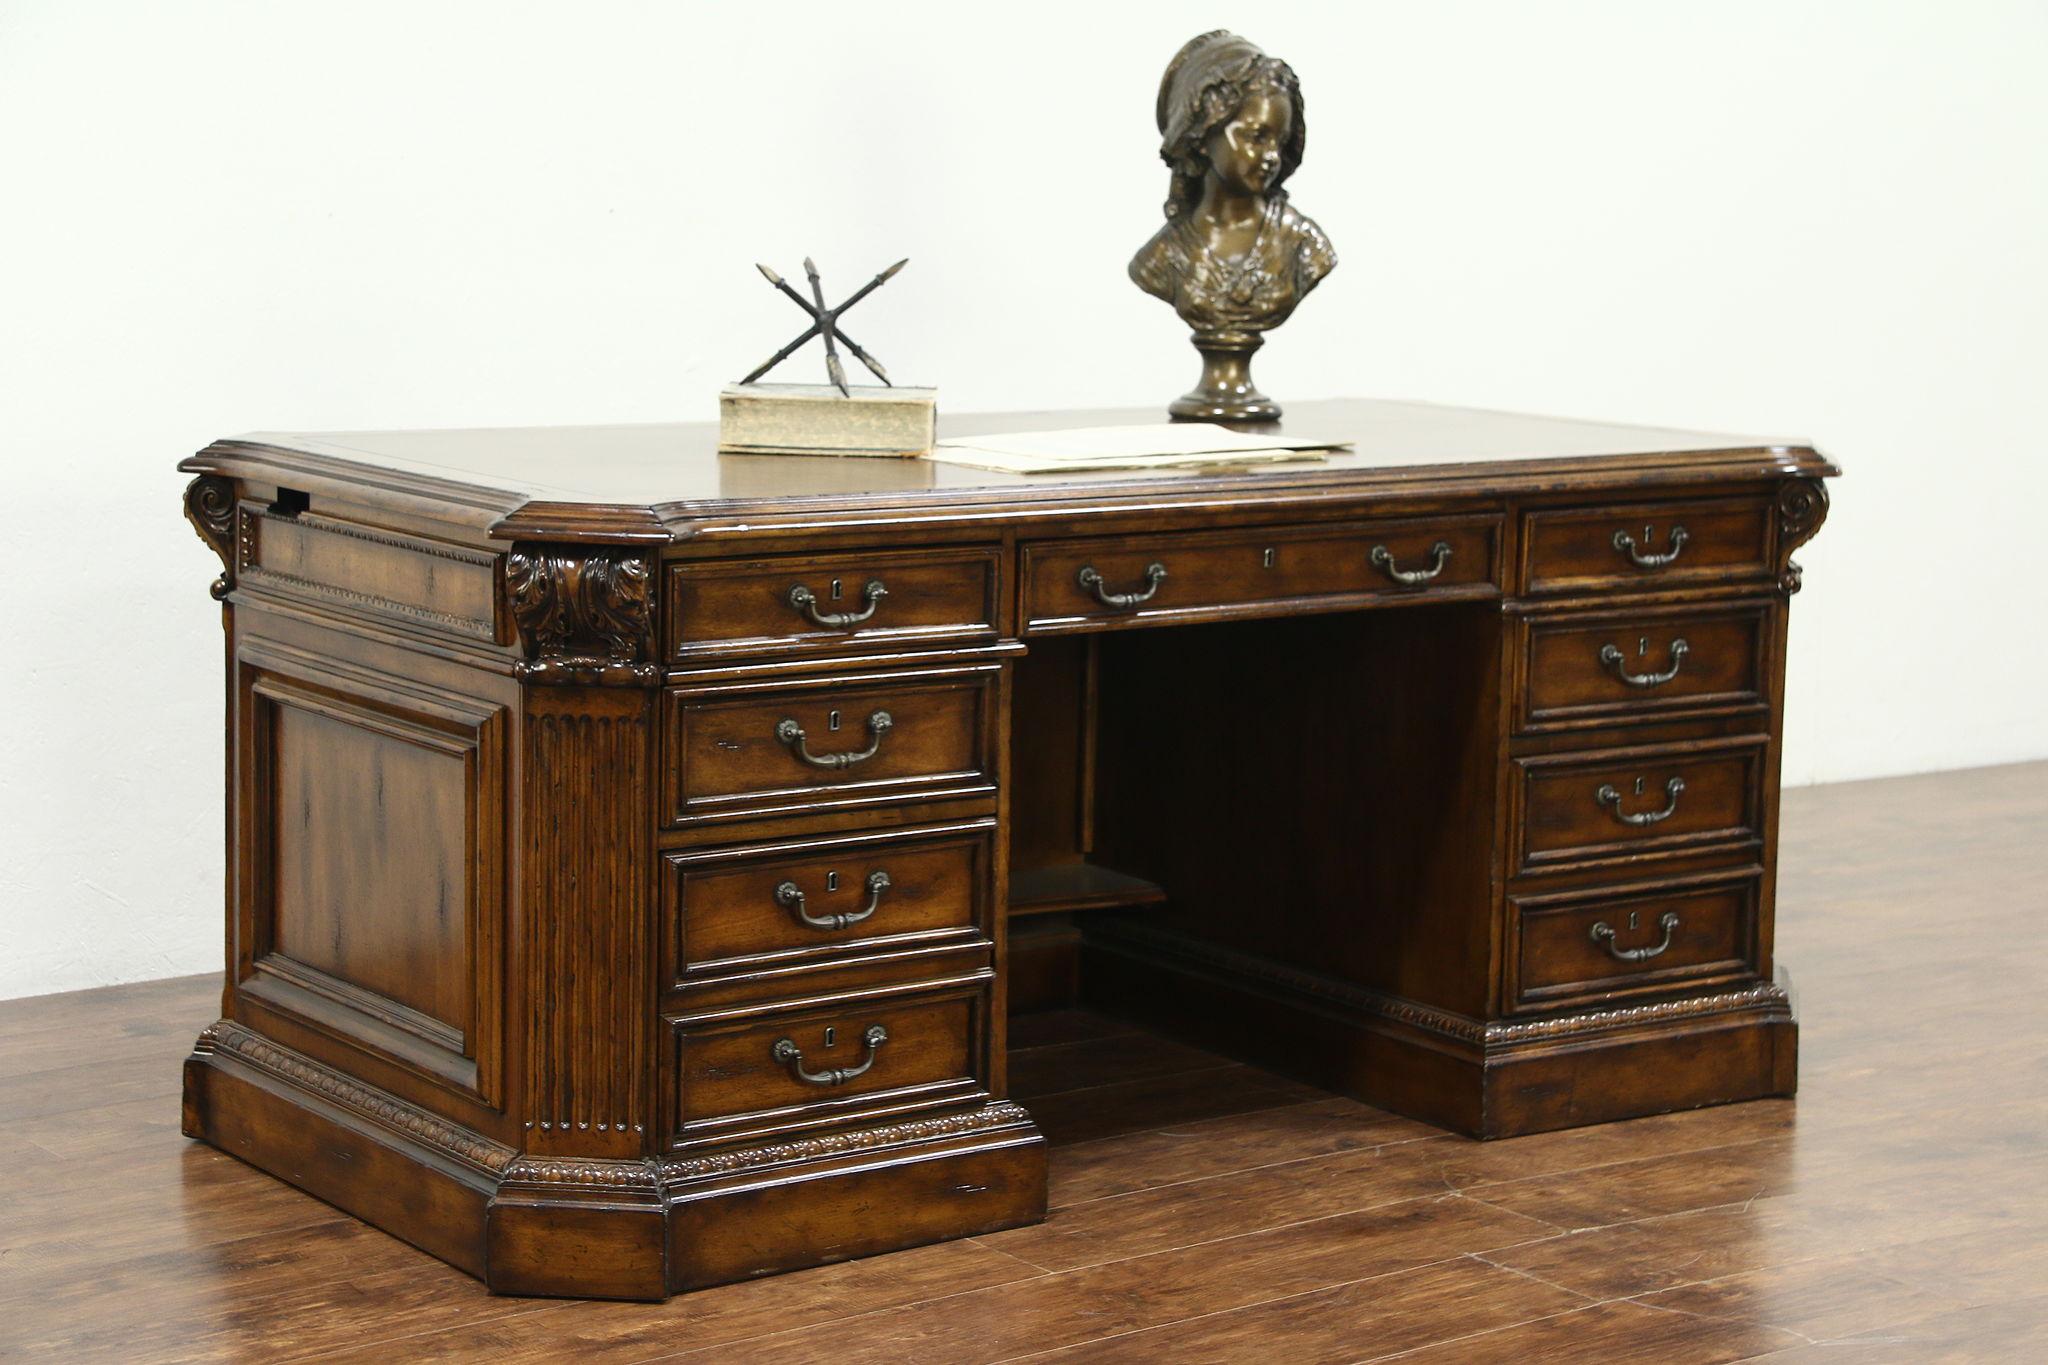 sligh furniture antique desk - furniture designs